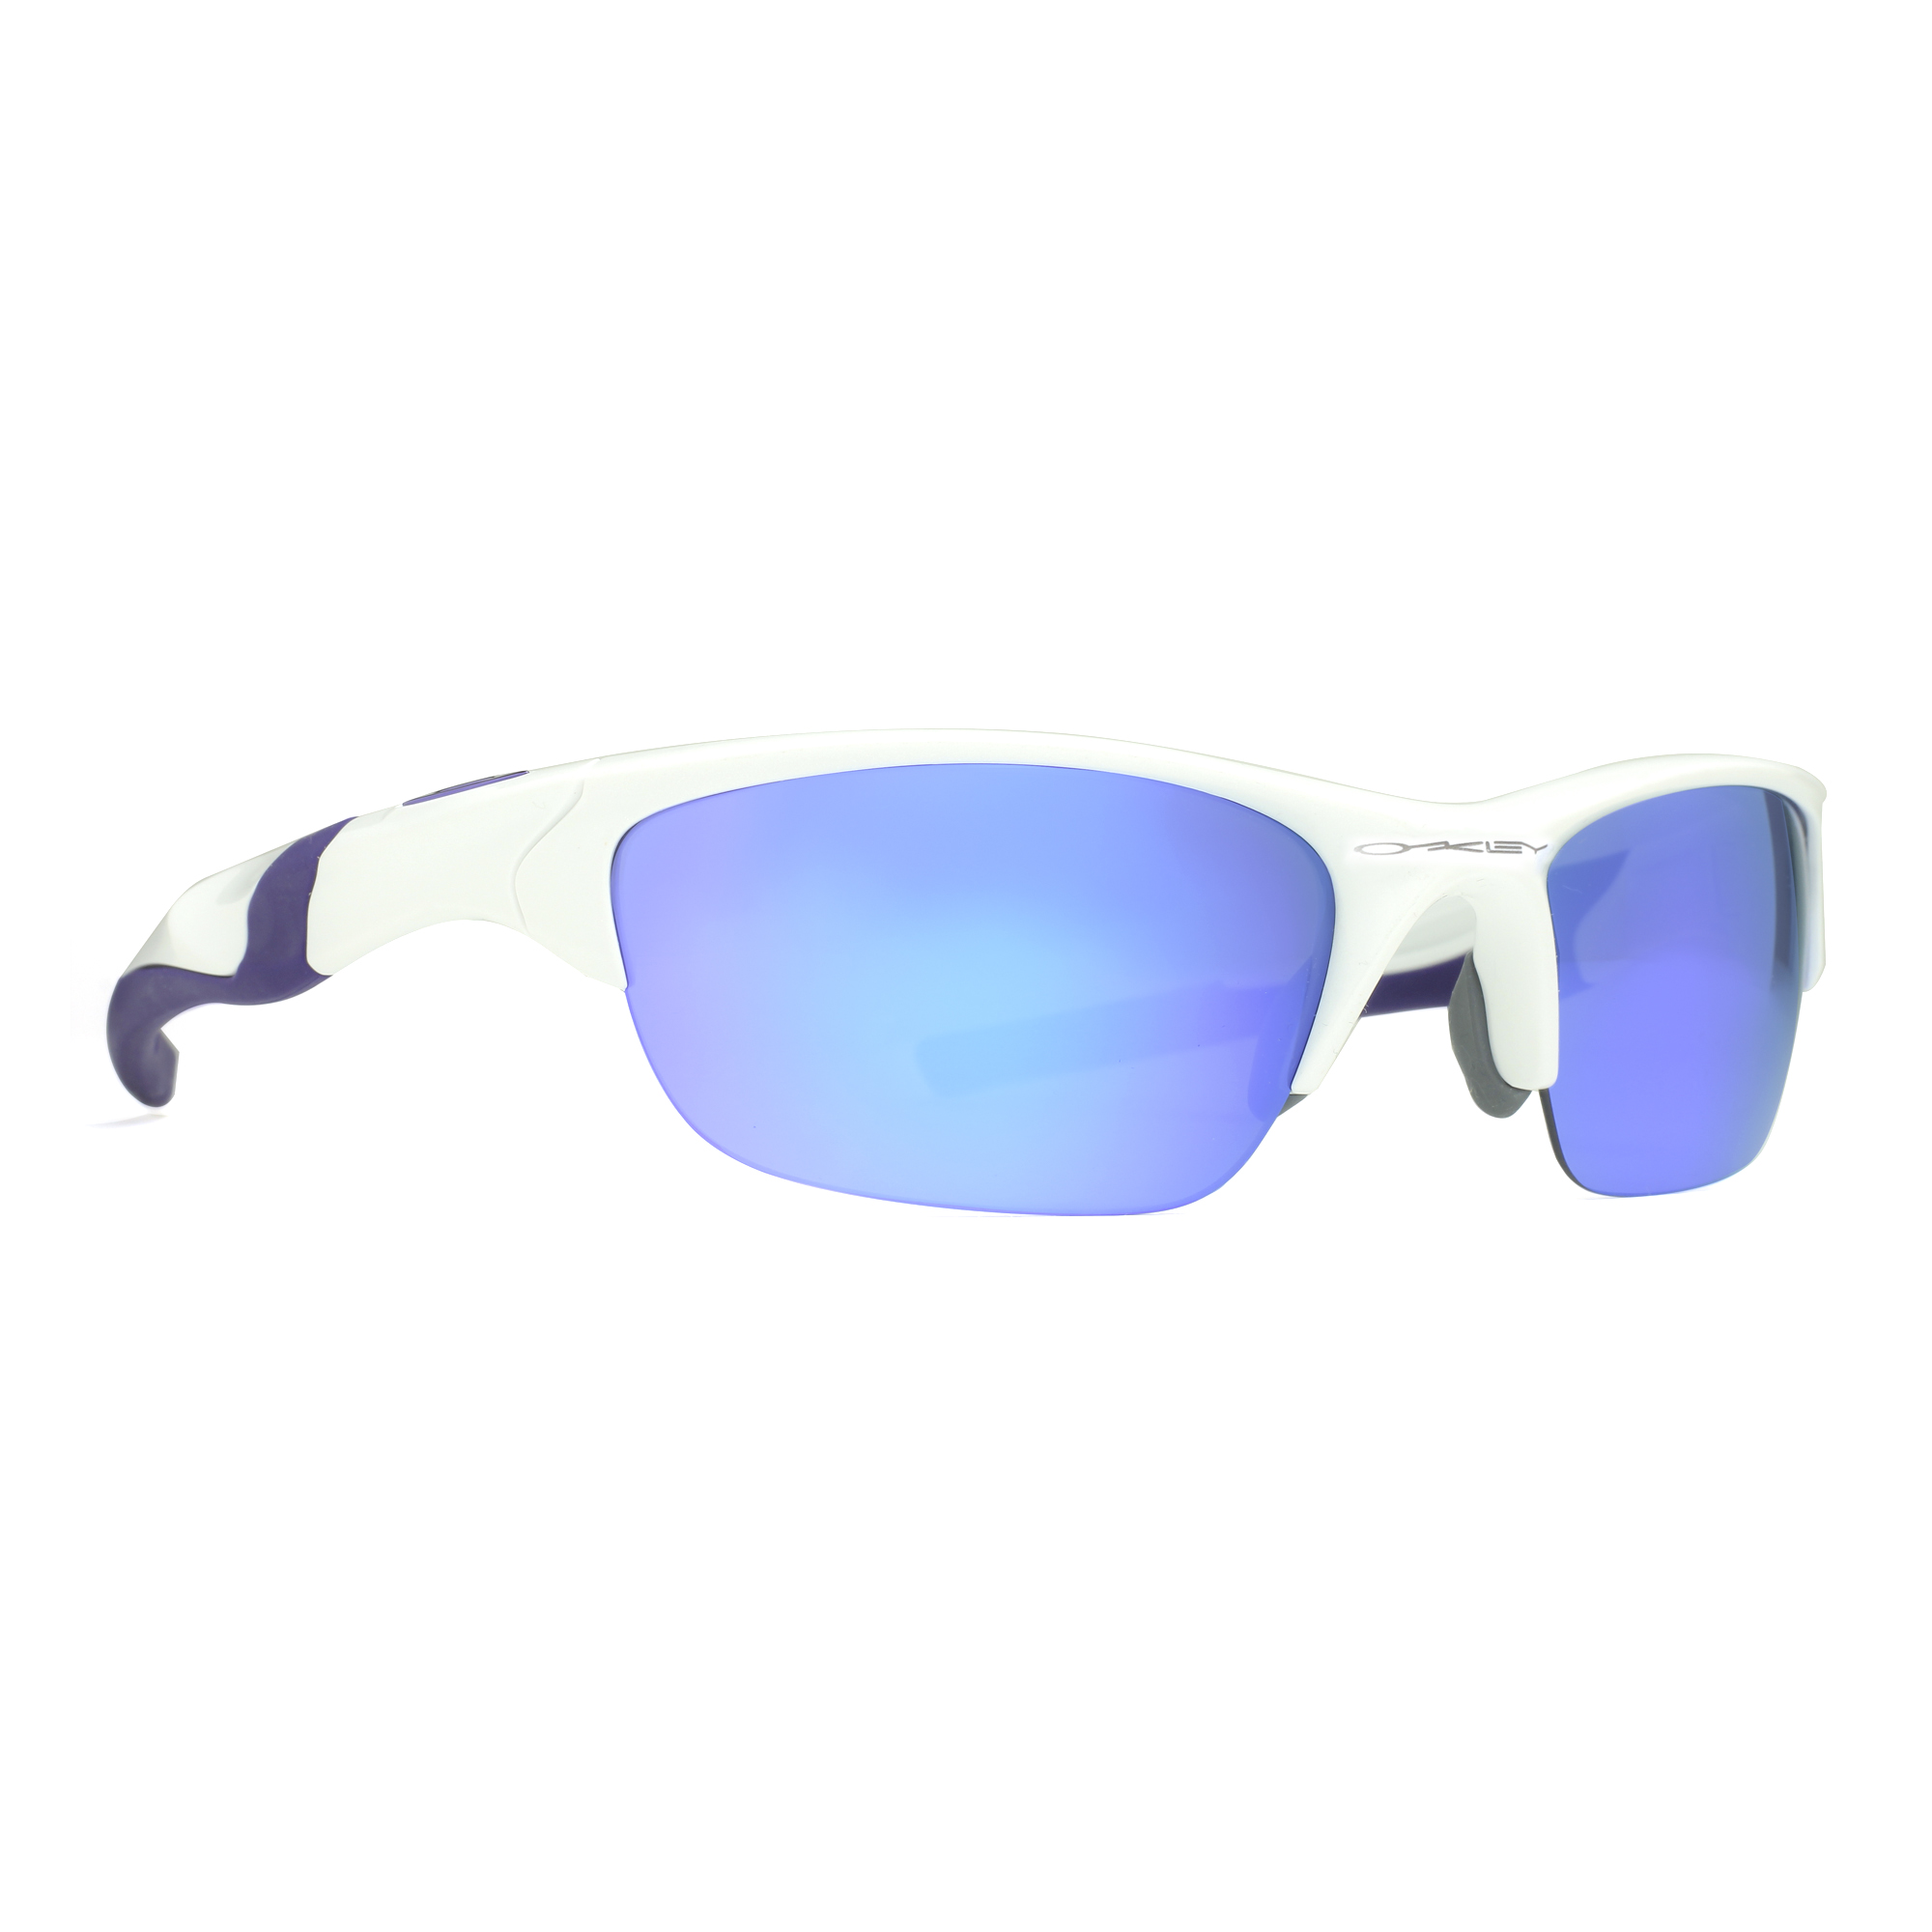 Oakley Half Jacket 2.0 Iridium Lens Sport Sunglasses   eBay